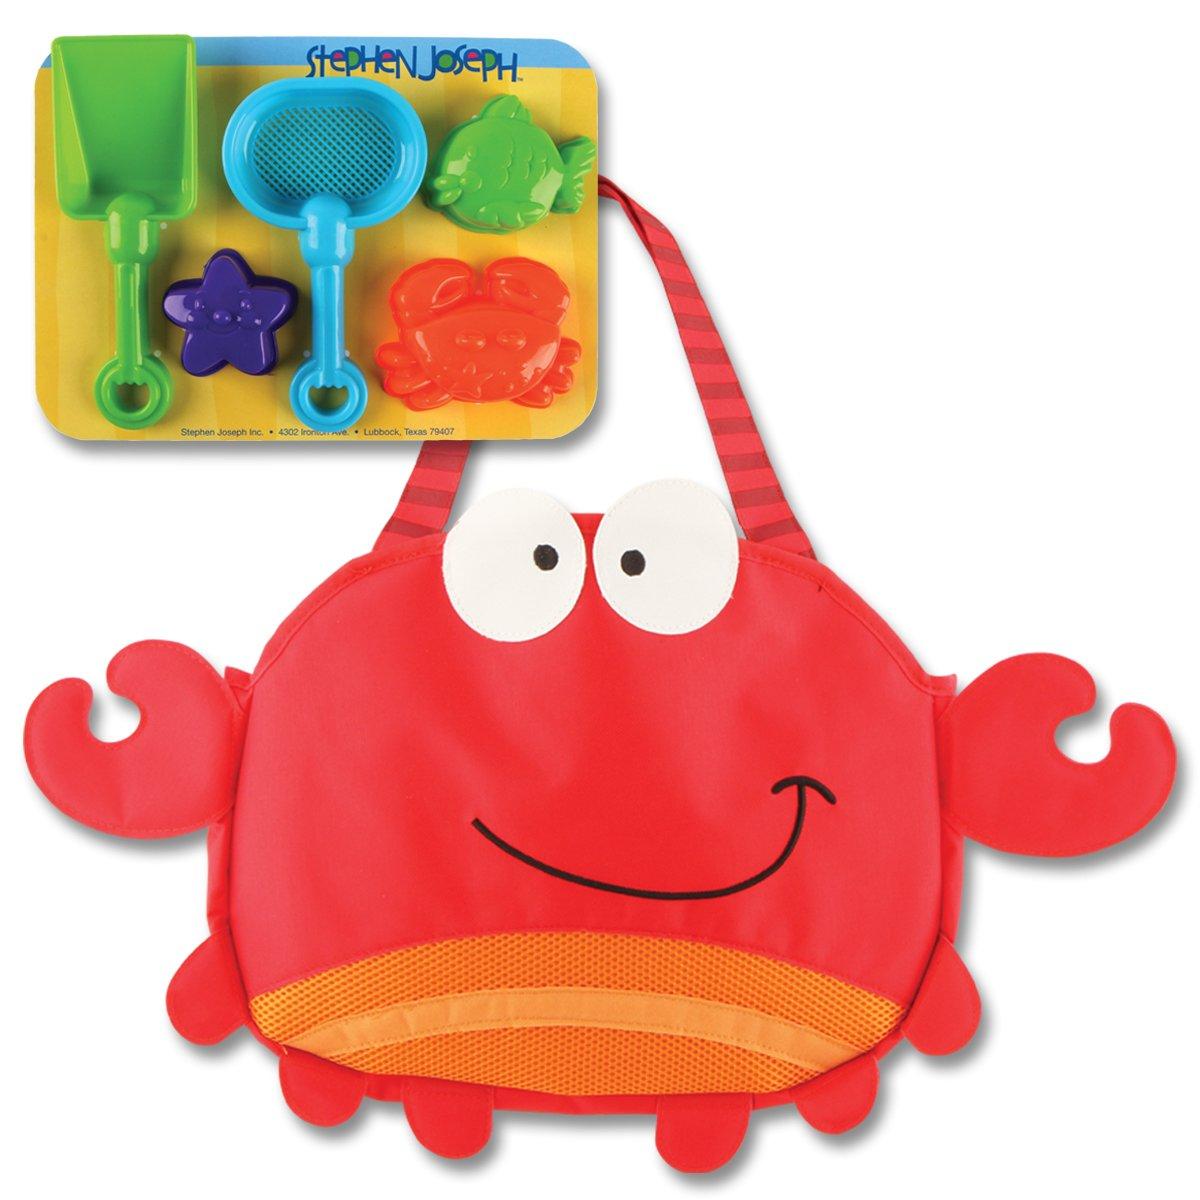 Amazon.com: Stephen Joseph Beach Tote, Shark: Varios: Toys & Games